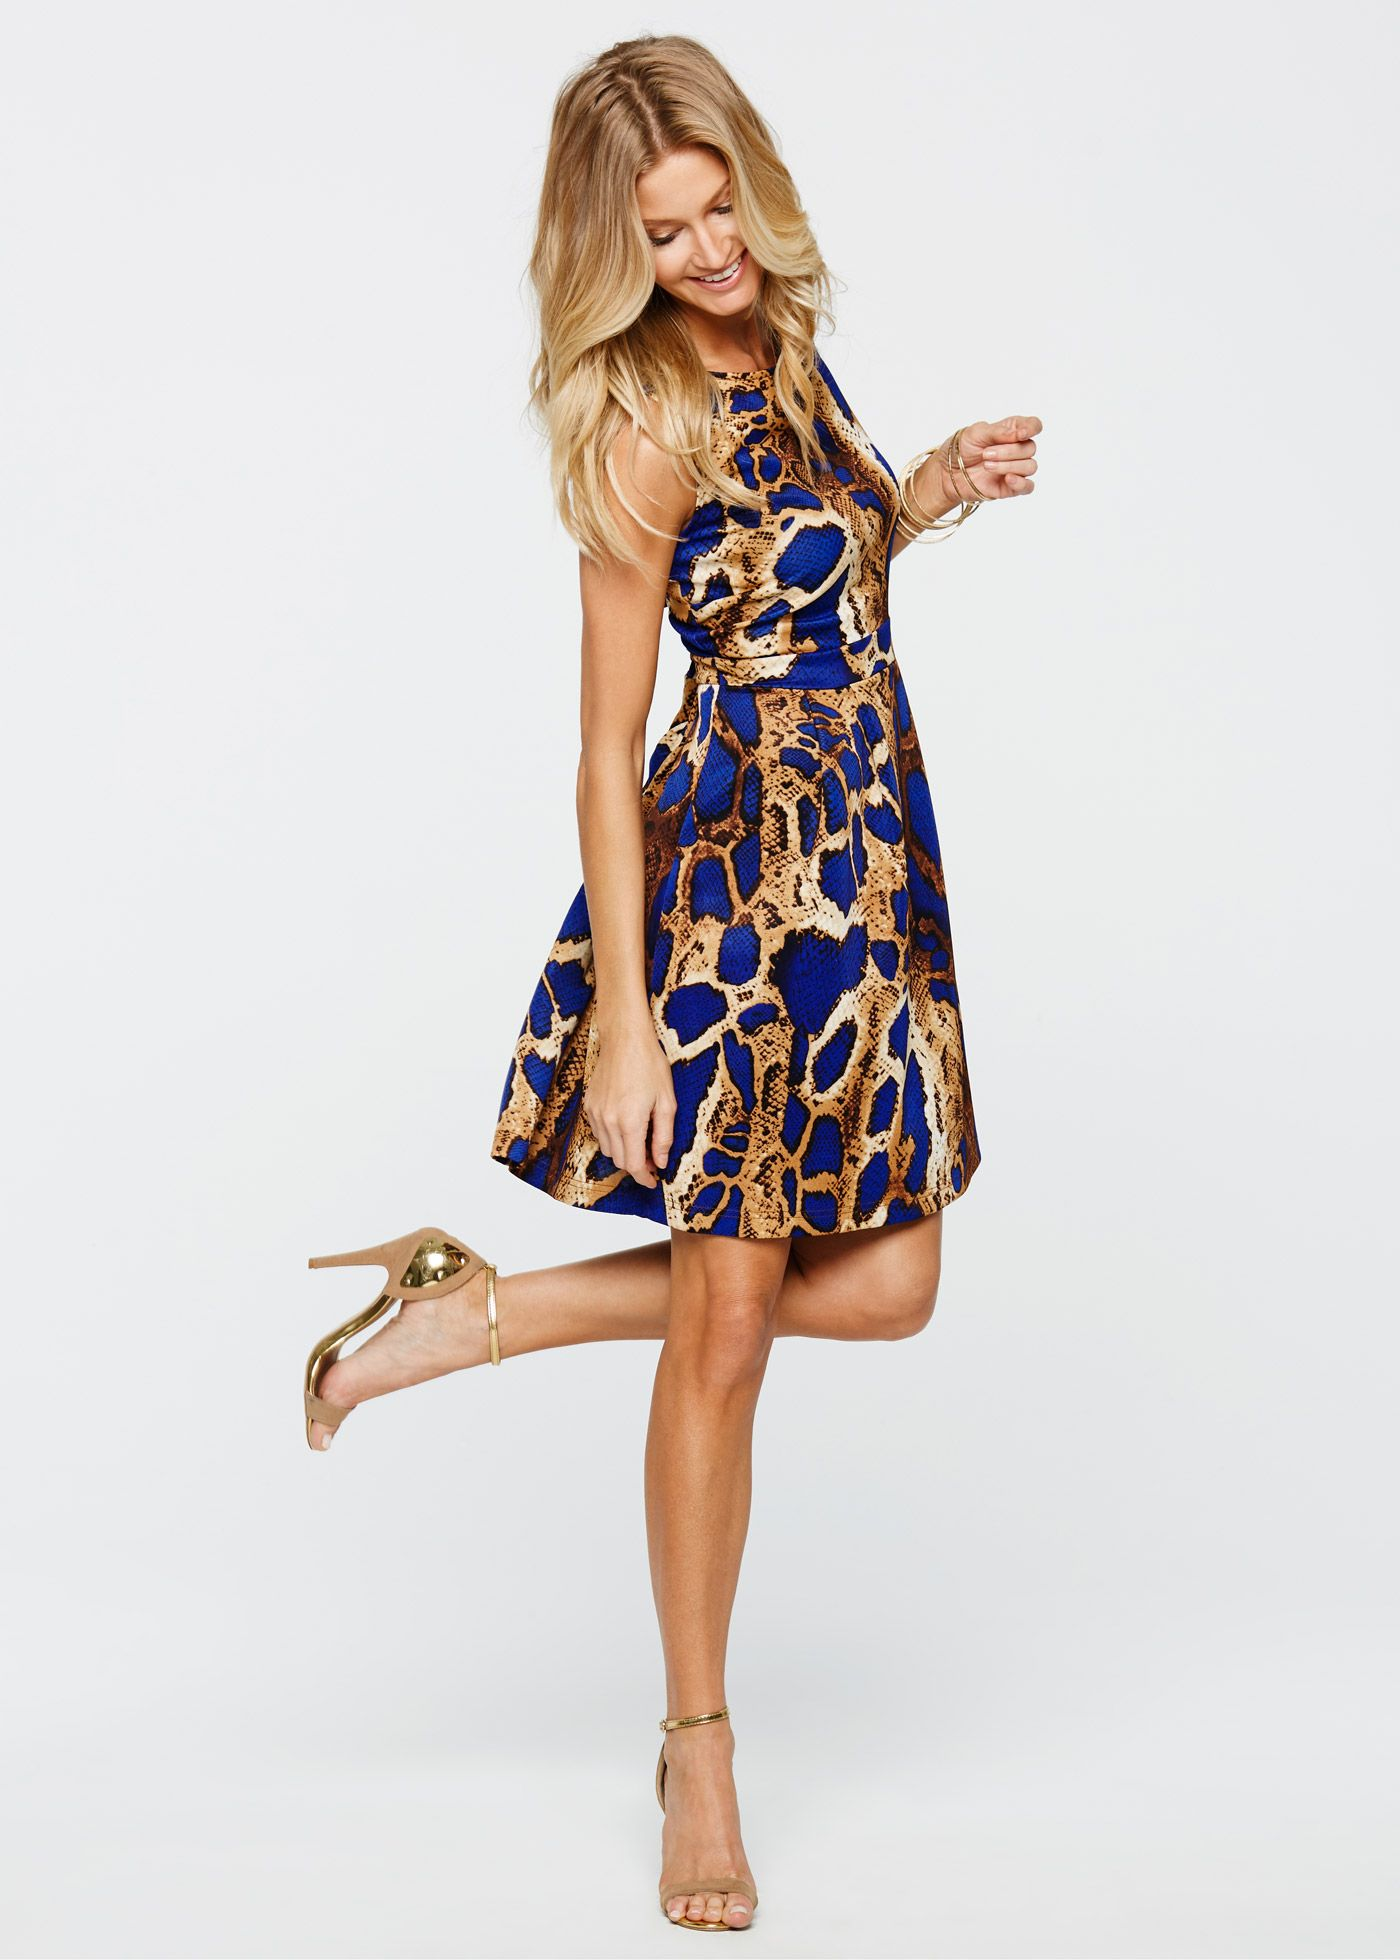 Kleid in Scubaoptik leopard blau - BODYFLIRT boutique jetzt im ...